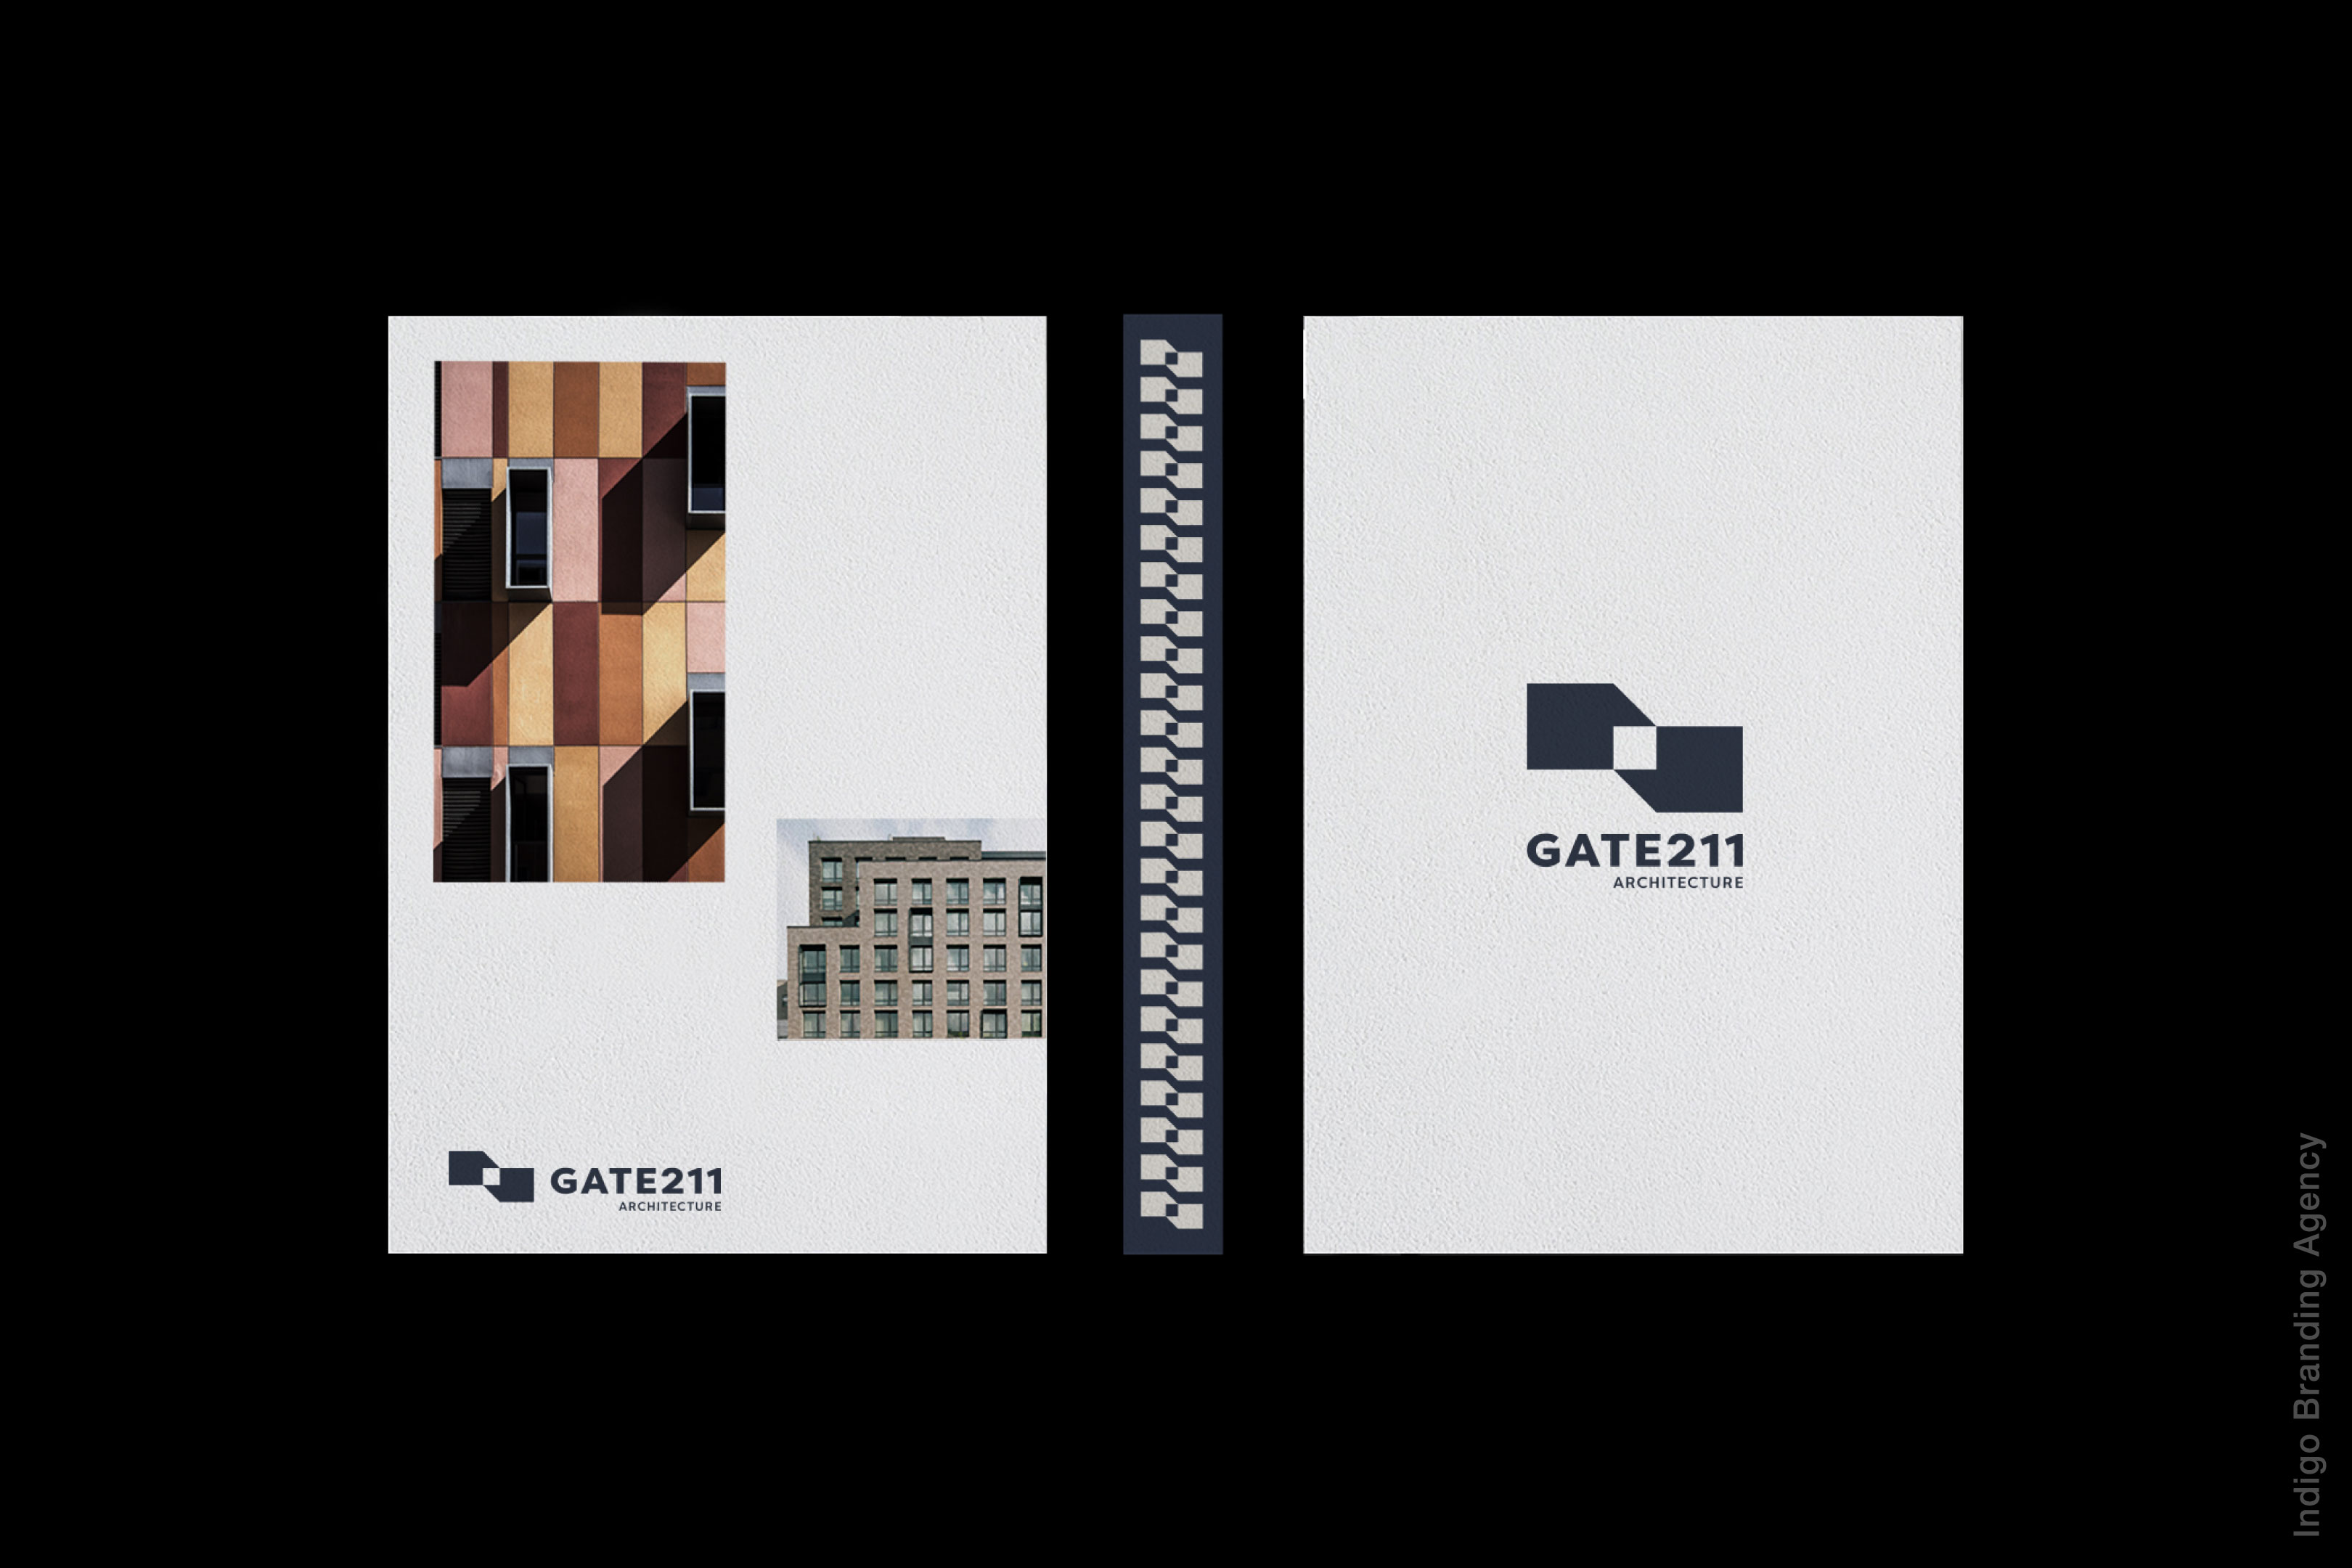 Gate 211 new york architectural studio branding and logo design by indigo branding agency